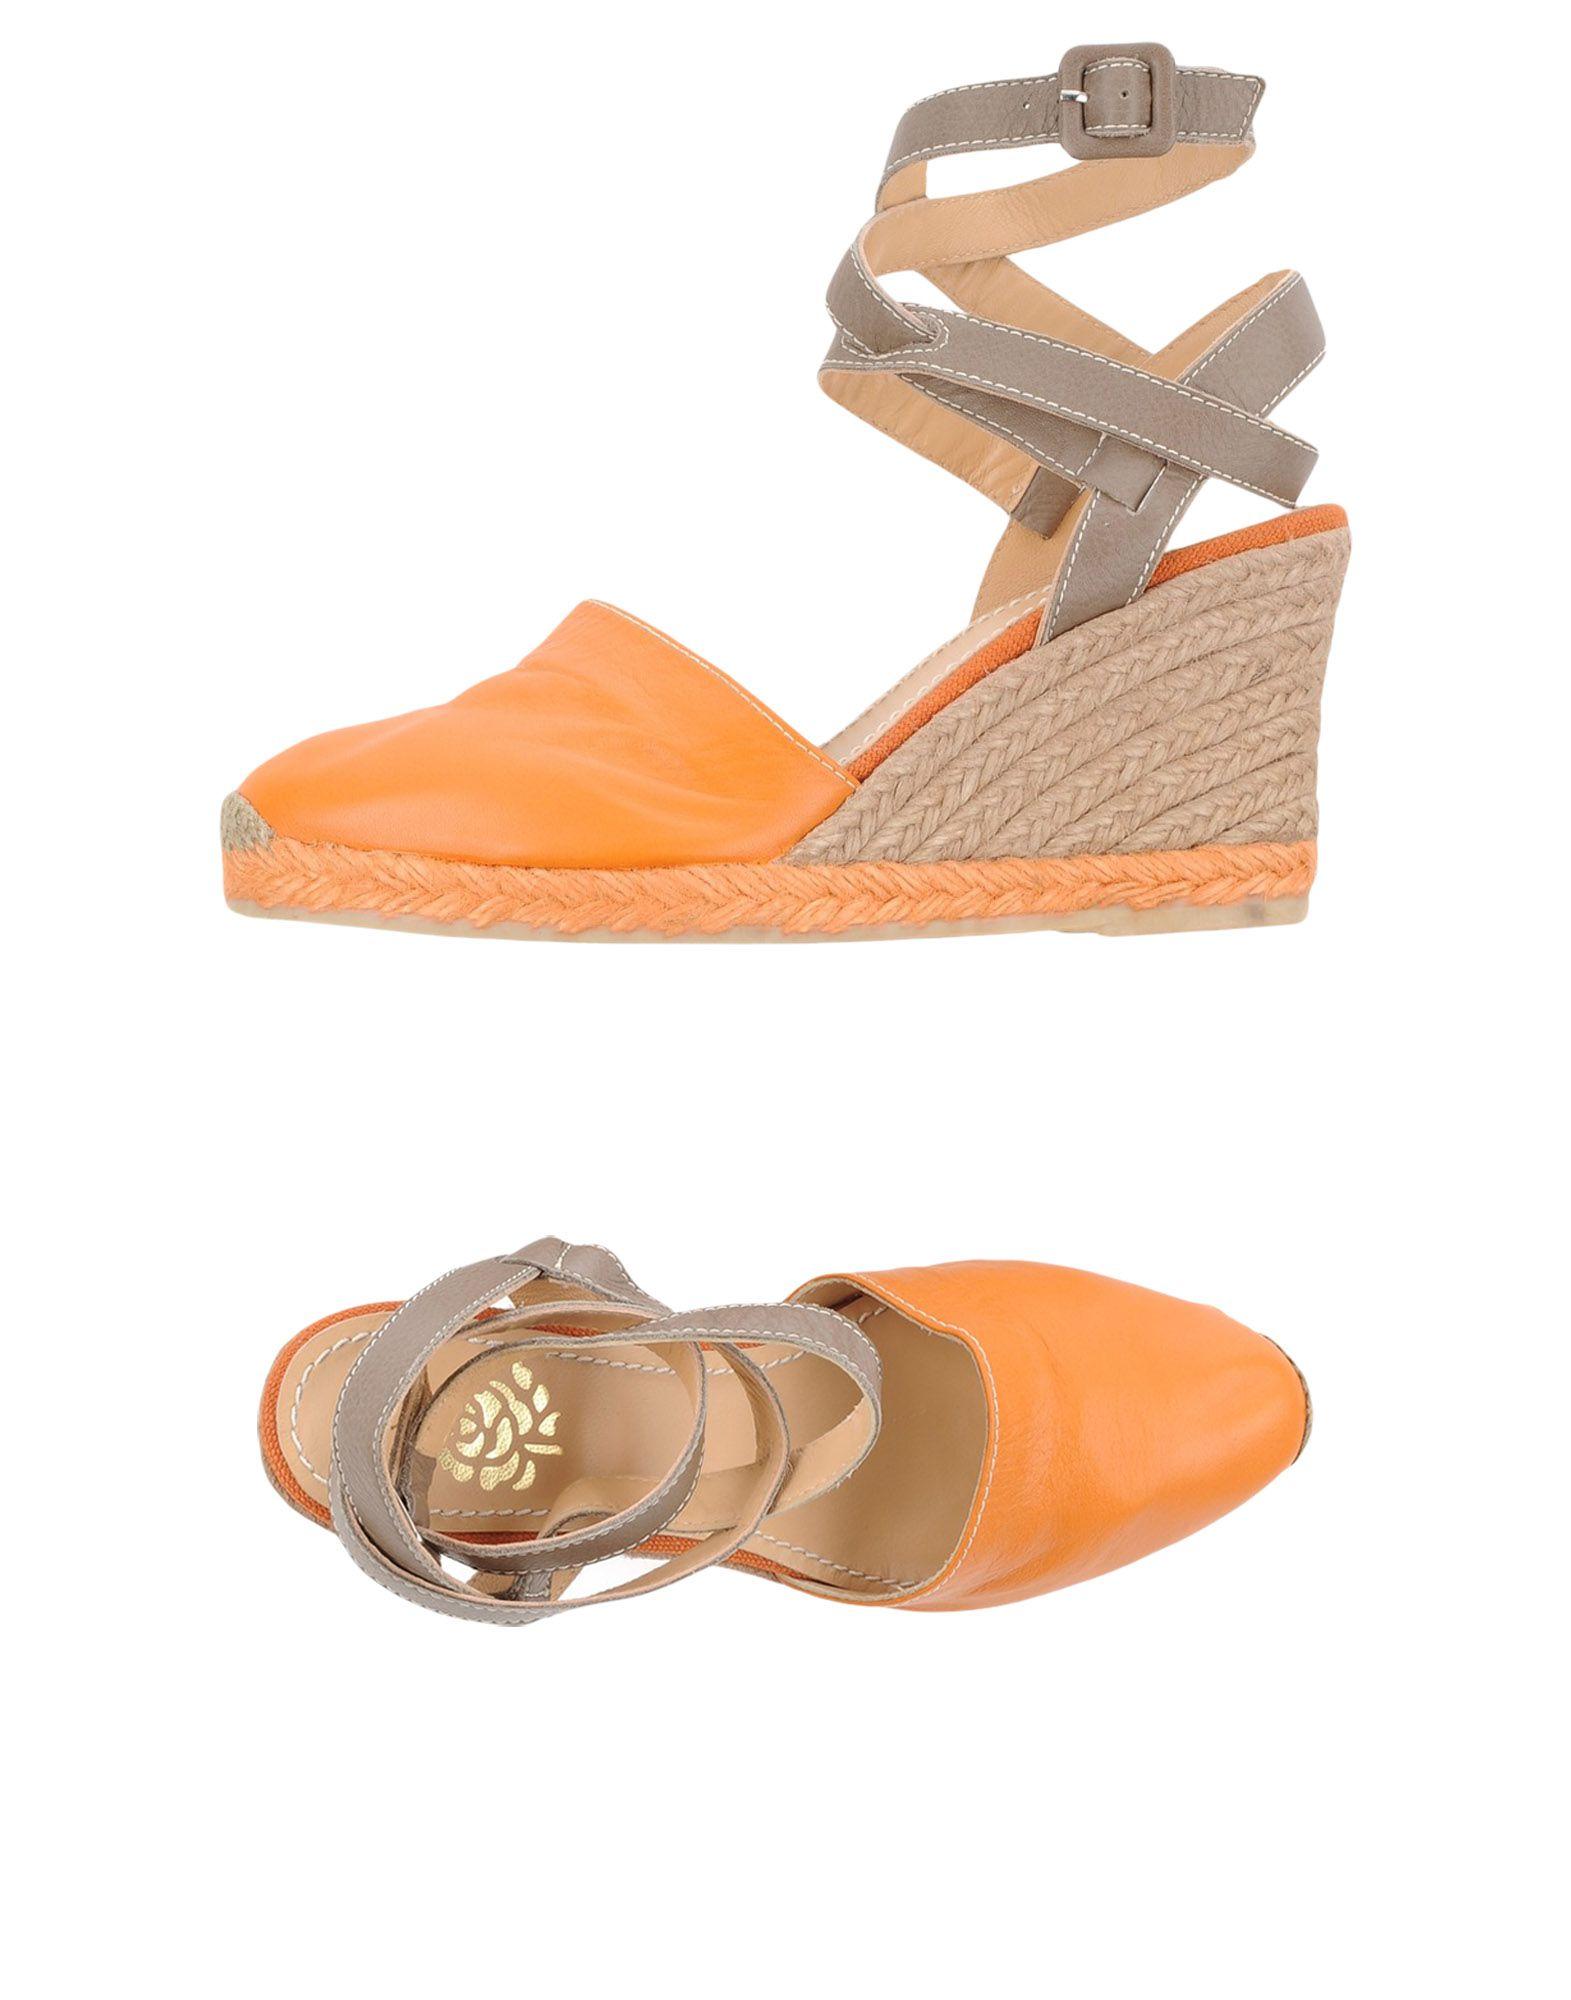 Malìparmi Espadrilles Damen  11098132DM Gute Qualität beliebte Schuhe